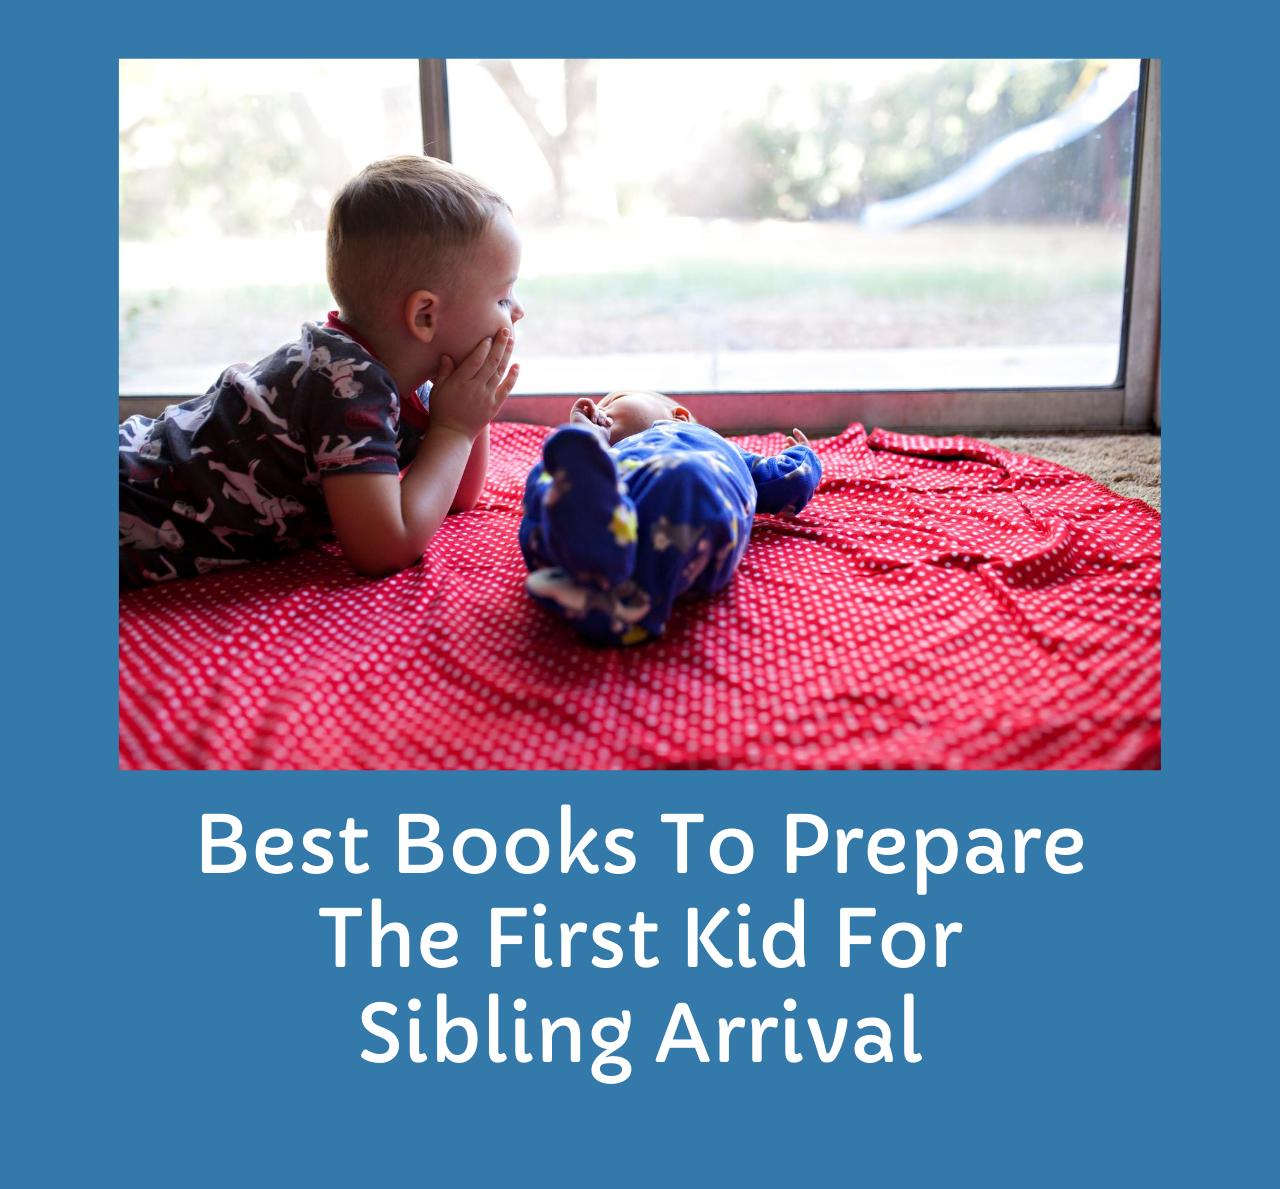 Prepare kid for sibling arrival